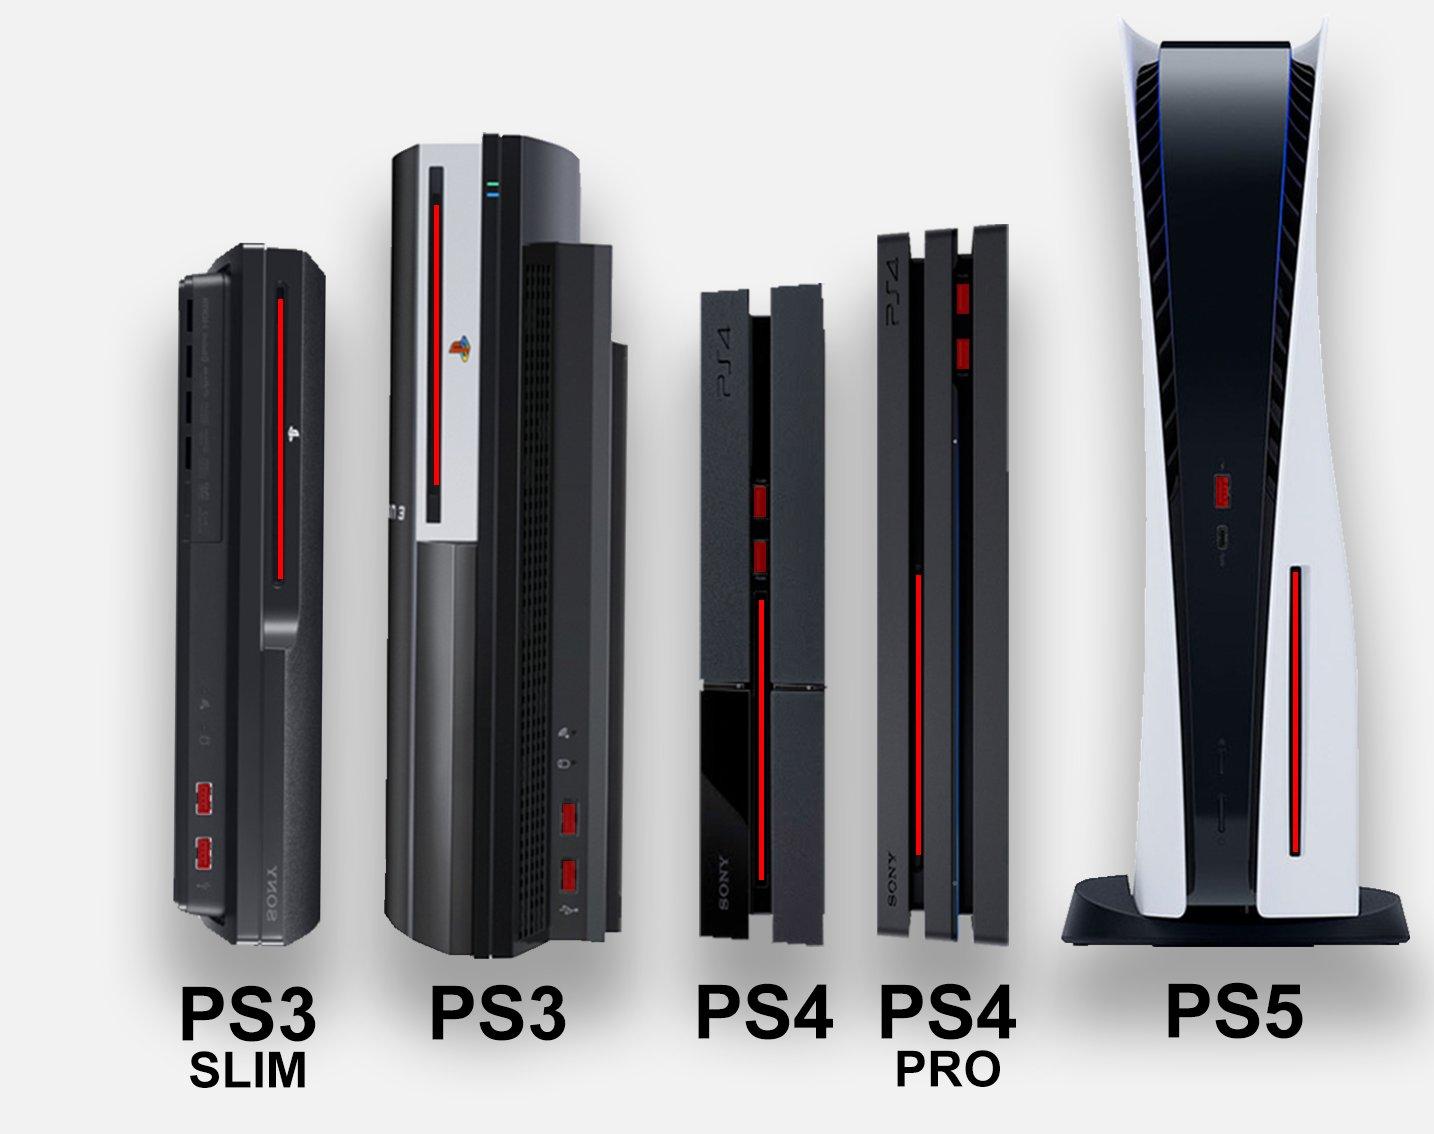 Размеры Playstation 5 сравнили с Xbox Series X, разница велика